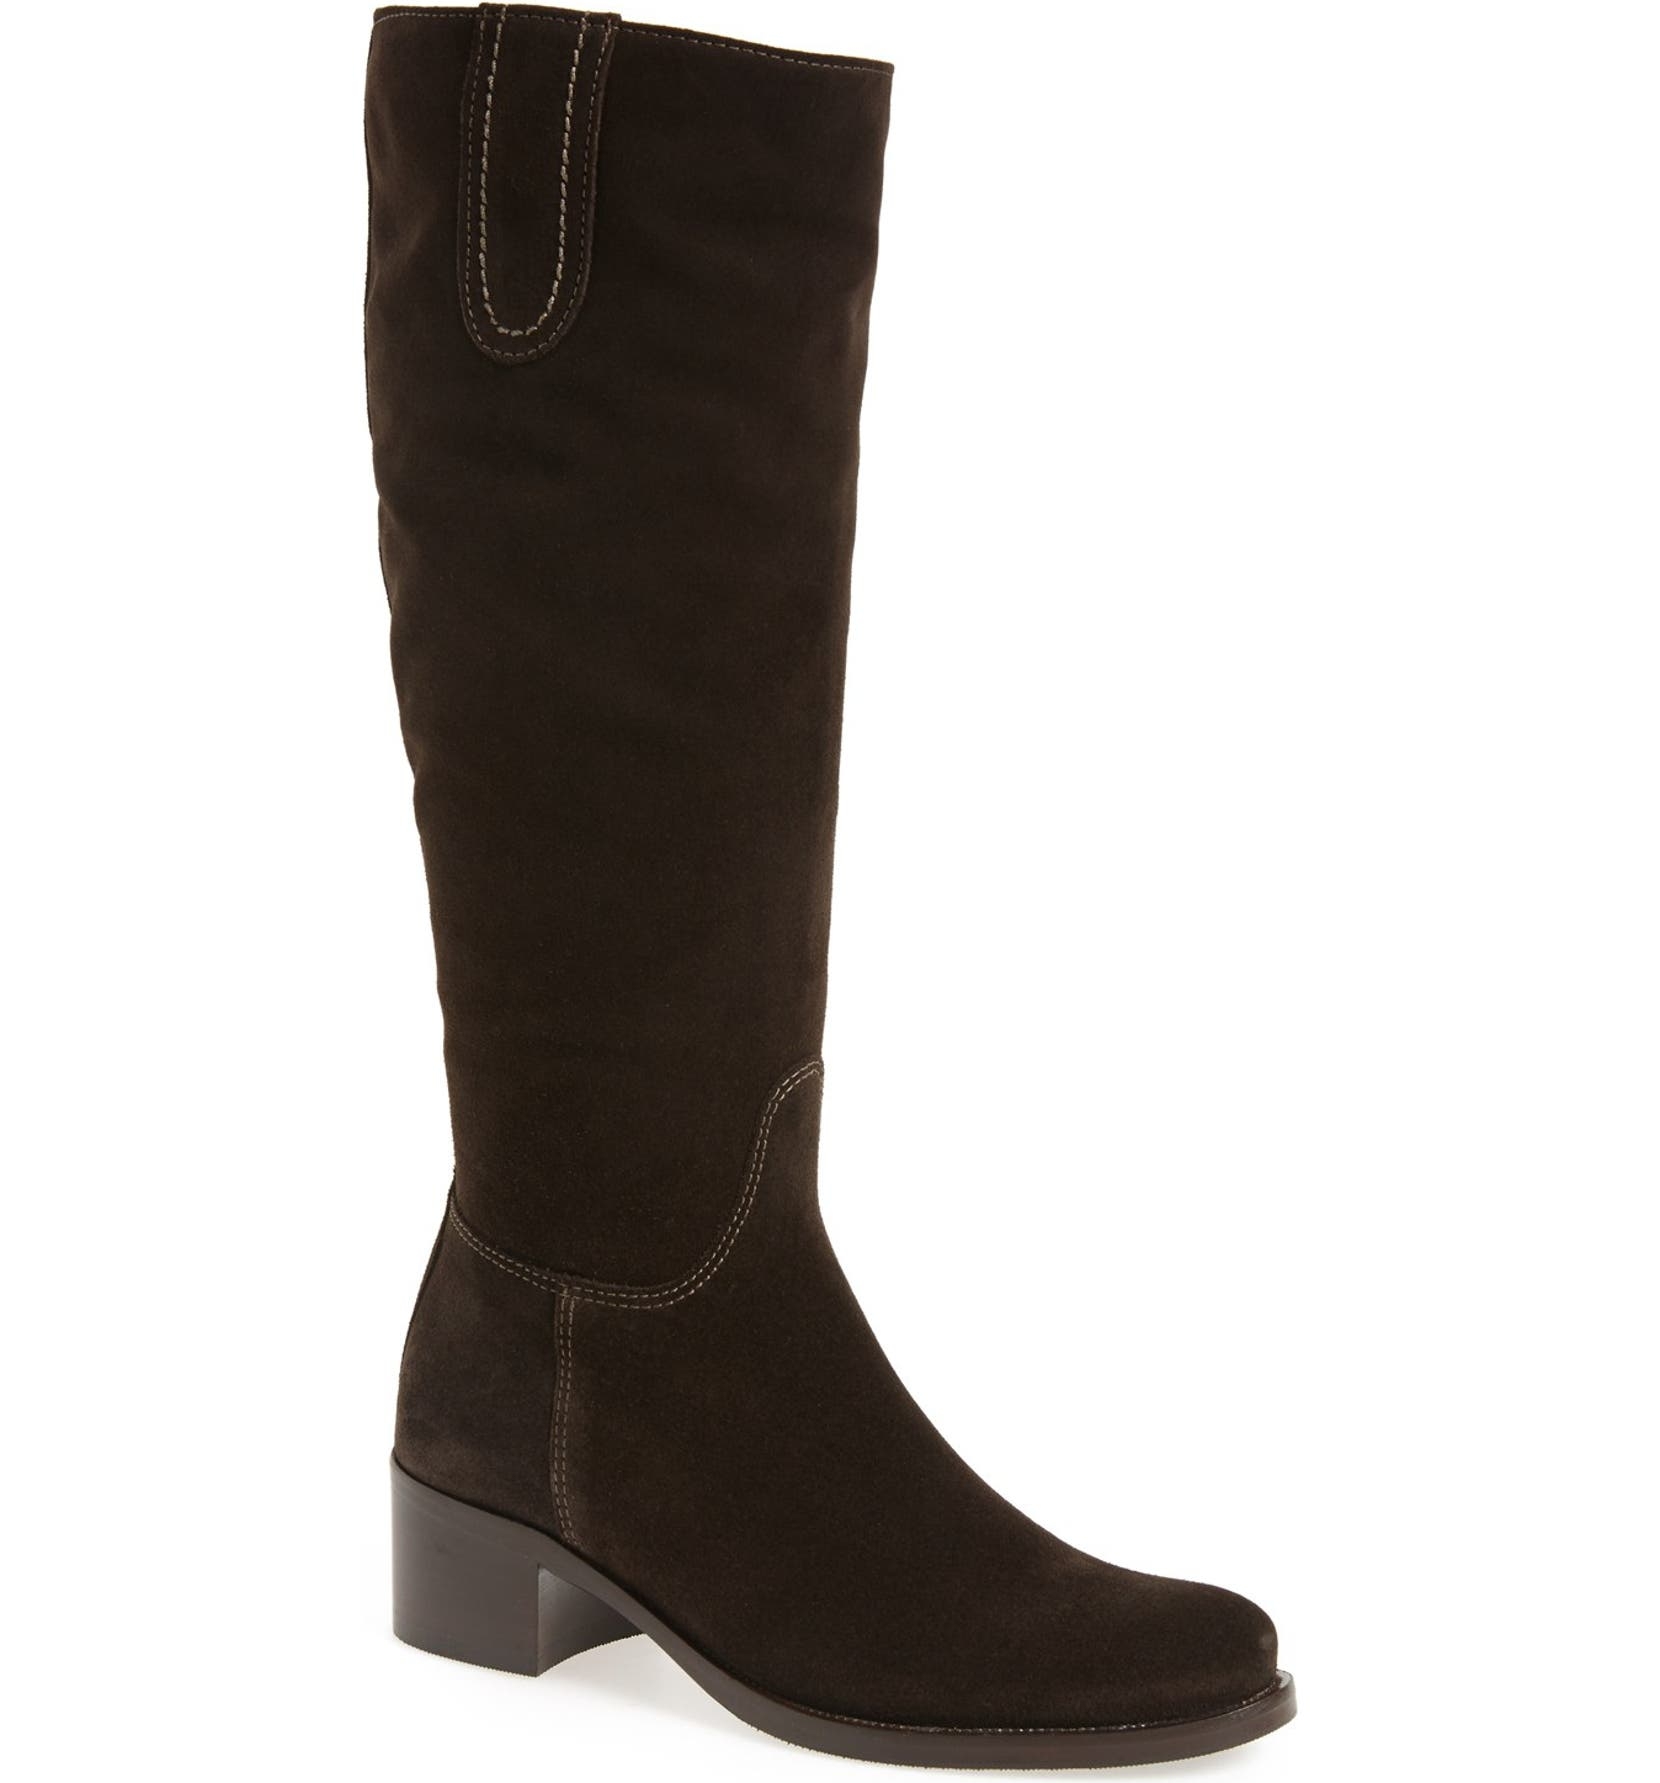 03a6dc338 La Canadienne 'Polly' Waterproof Knee High Boot (Women) | Nordstrom